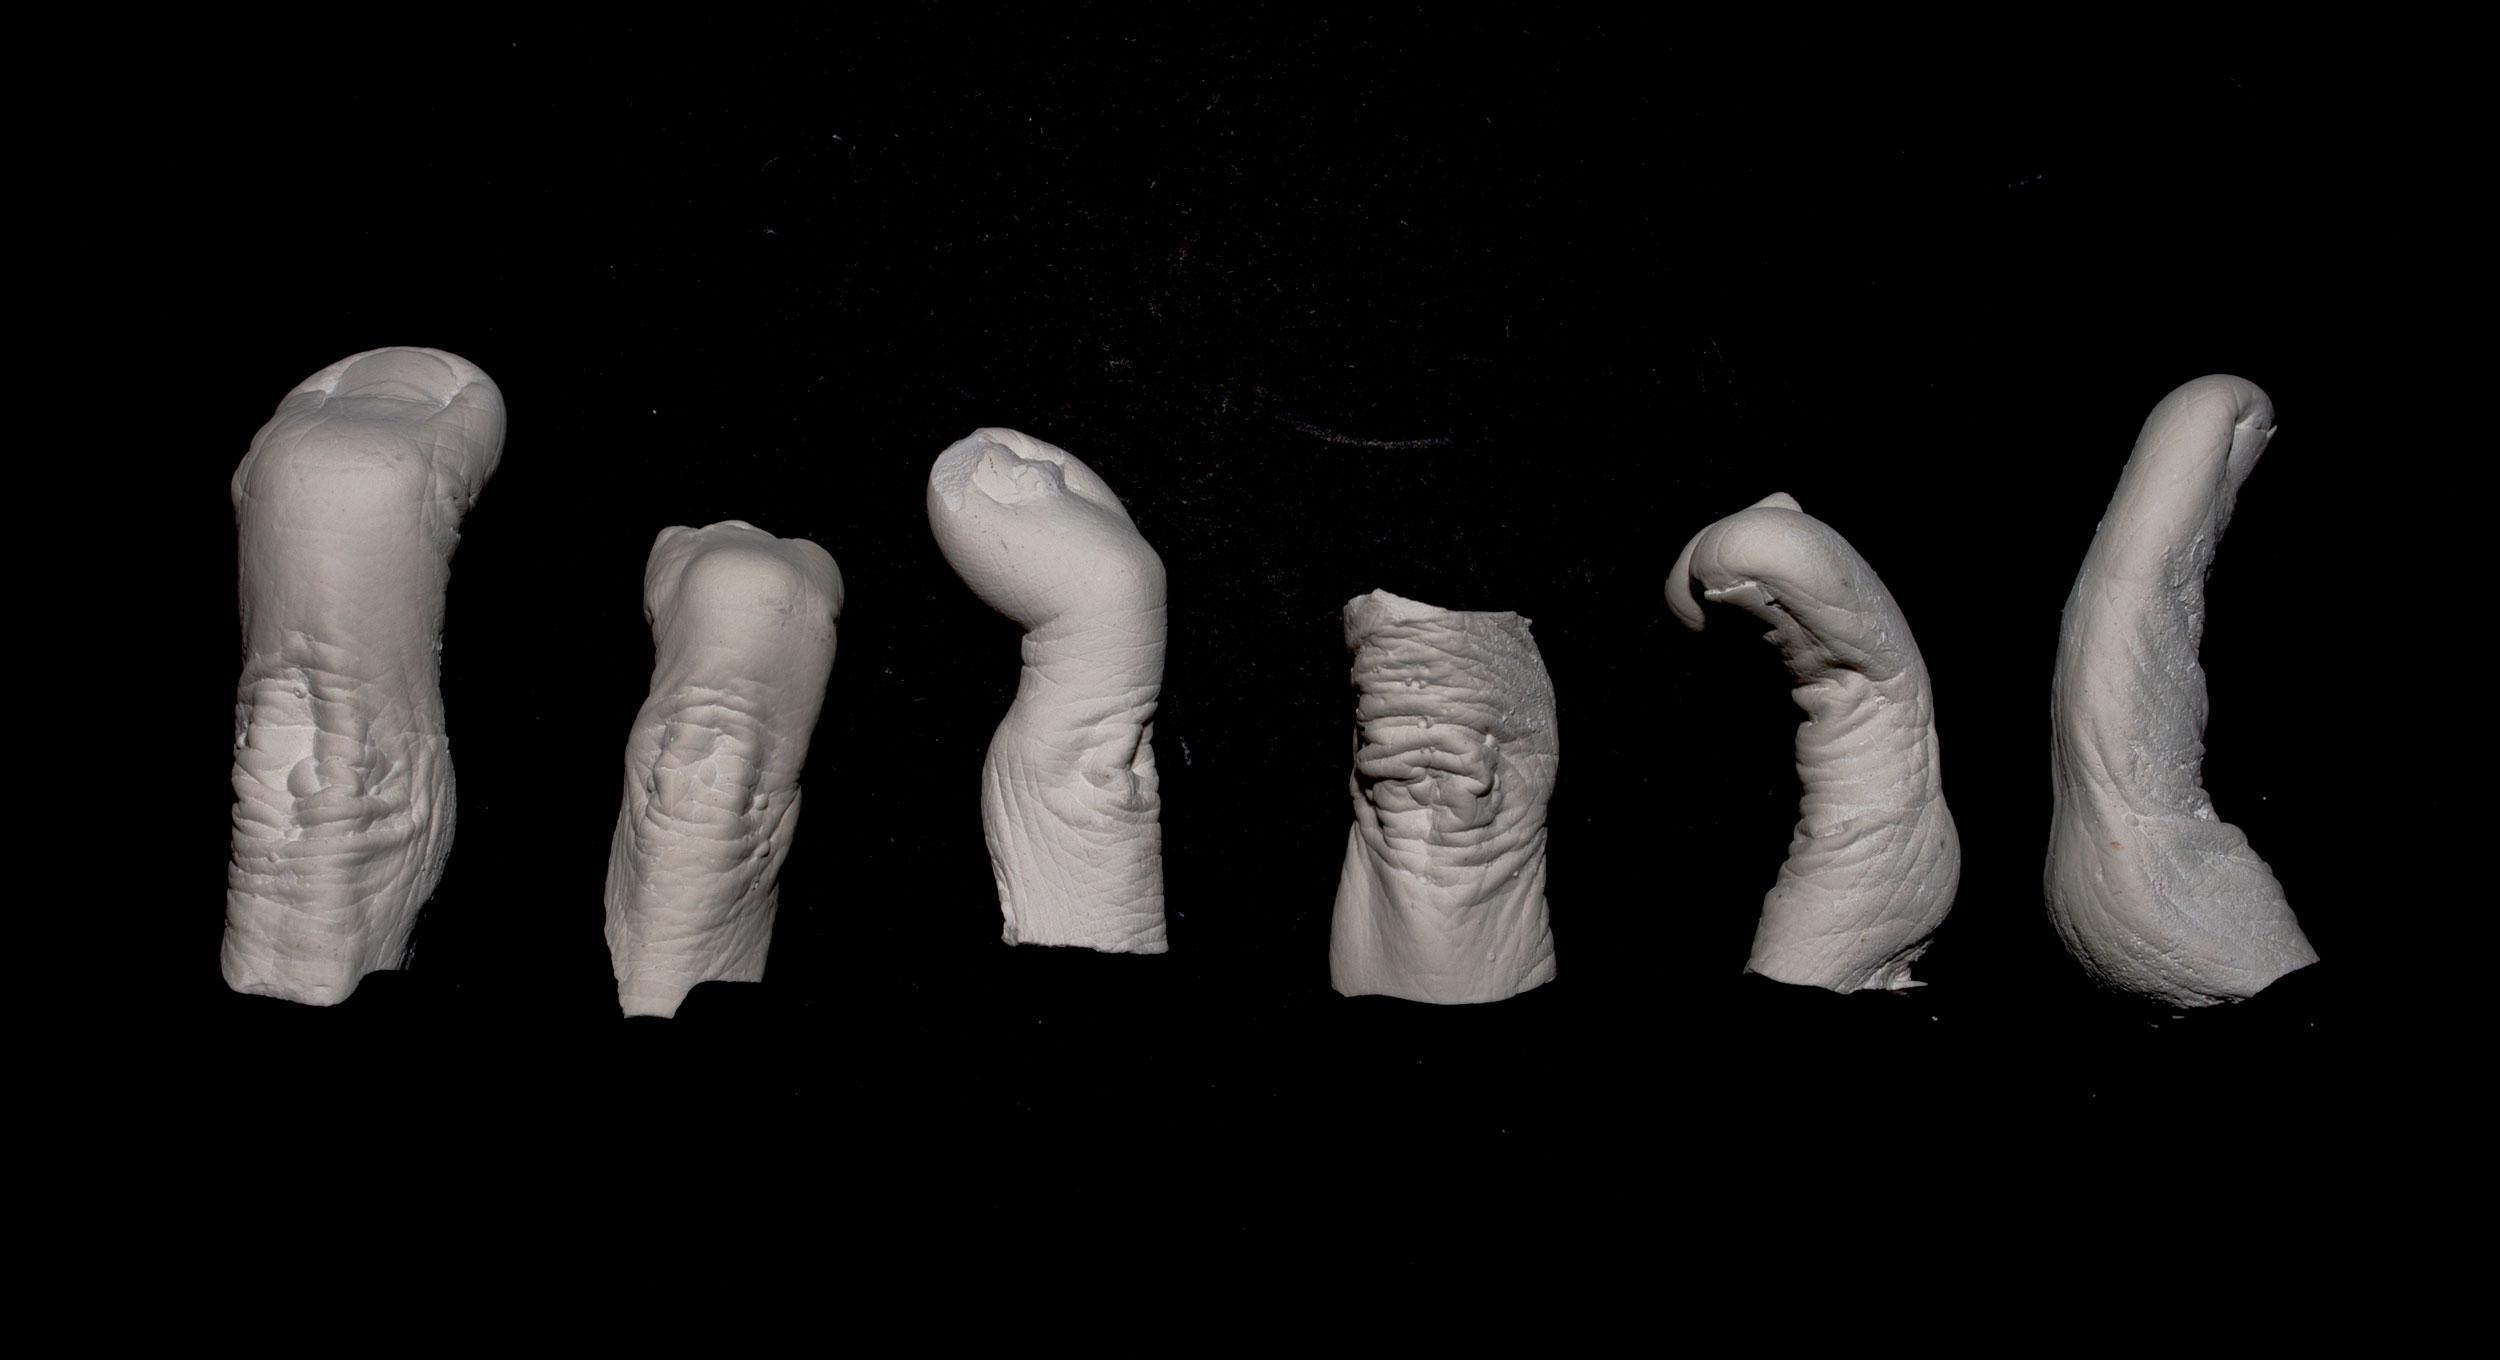 Wendy Richmond hand sculpture fingers archaeology